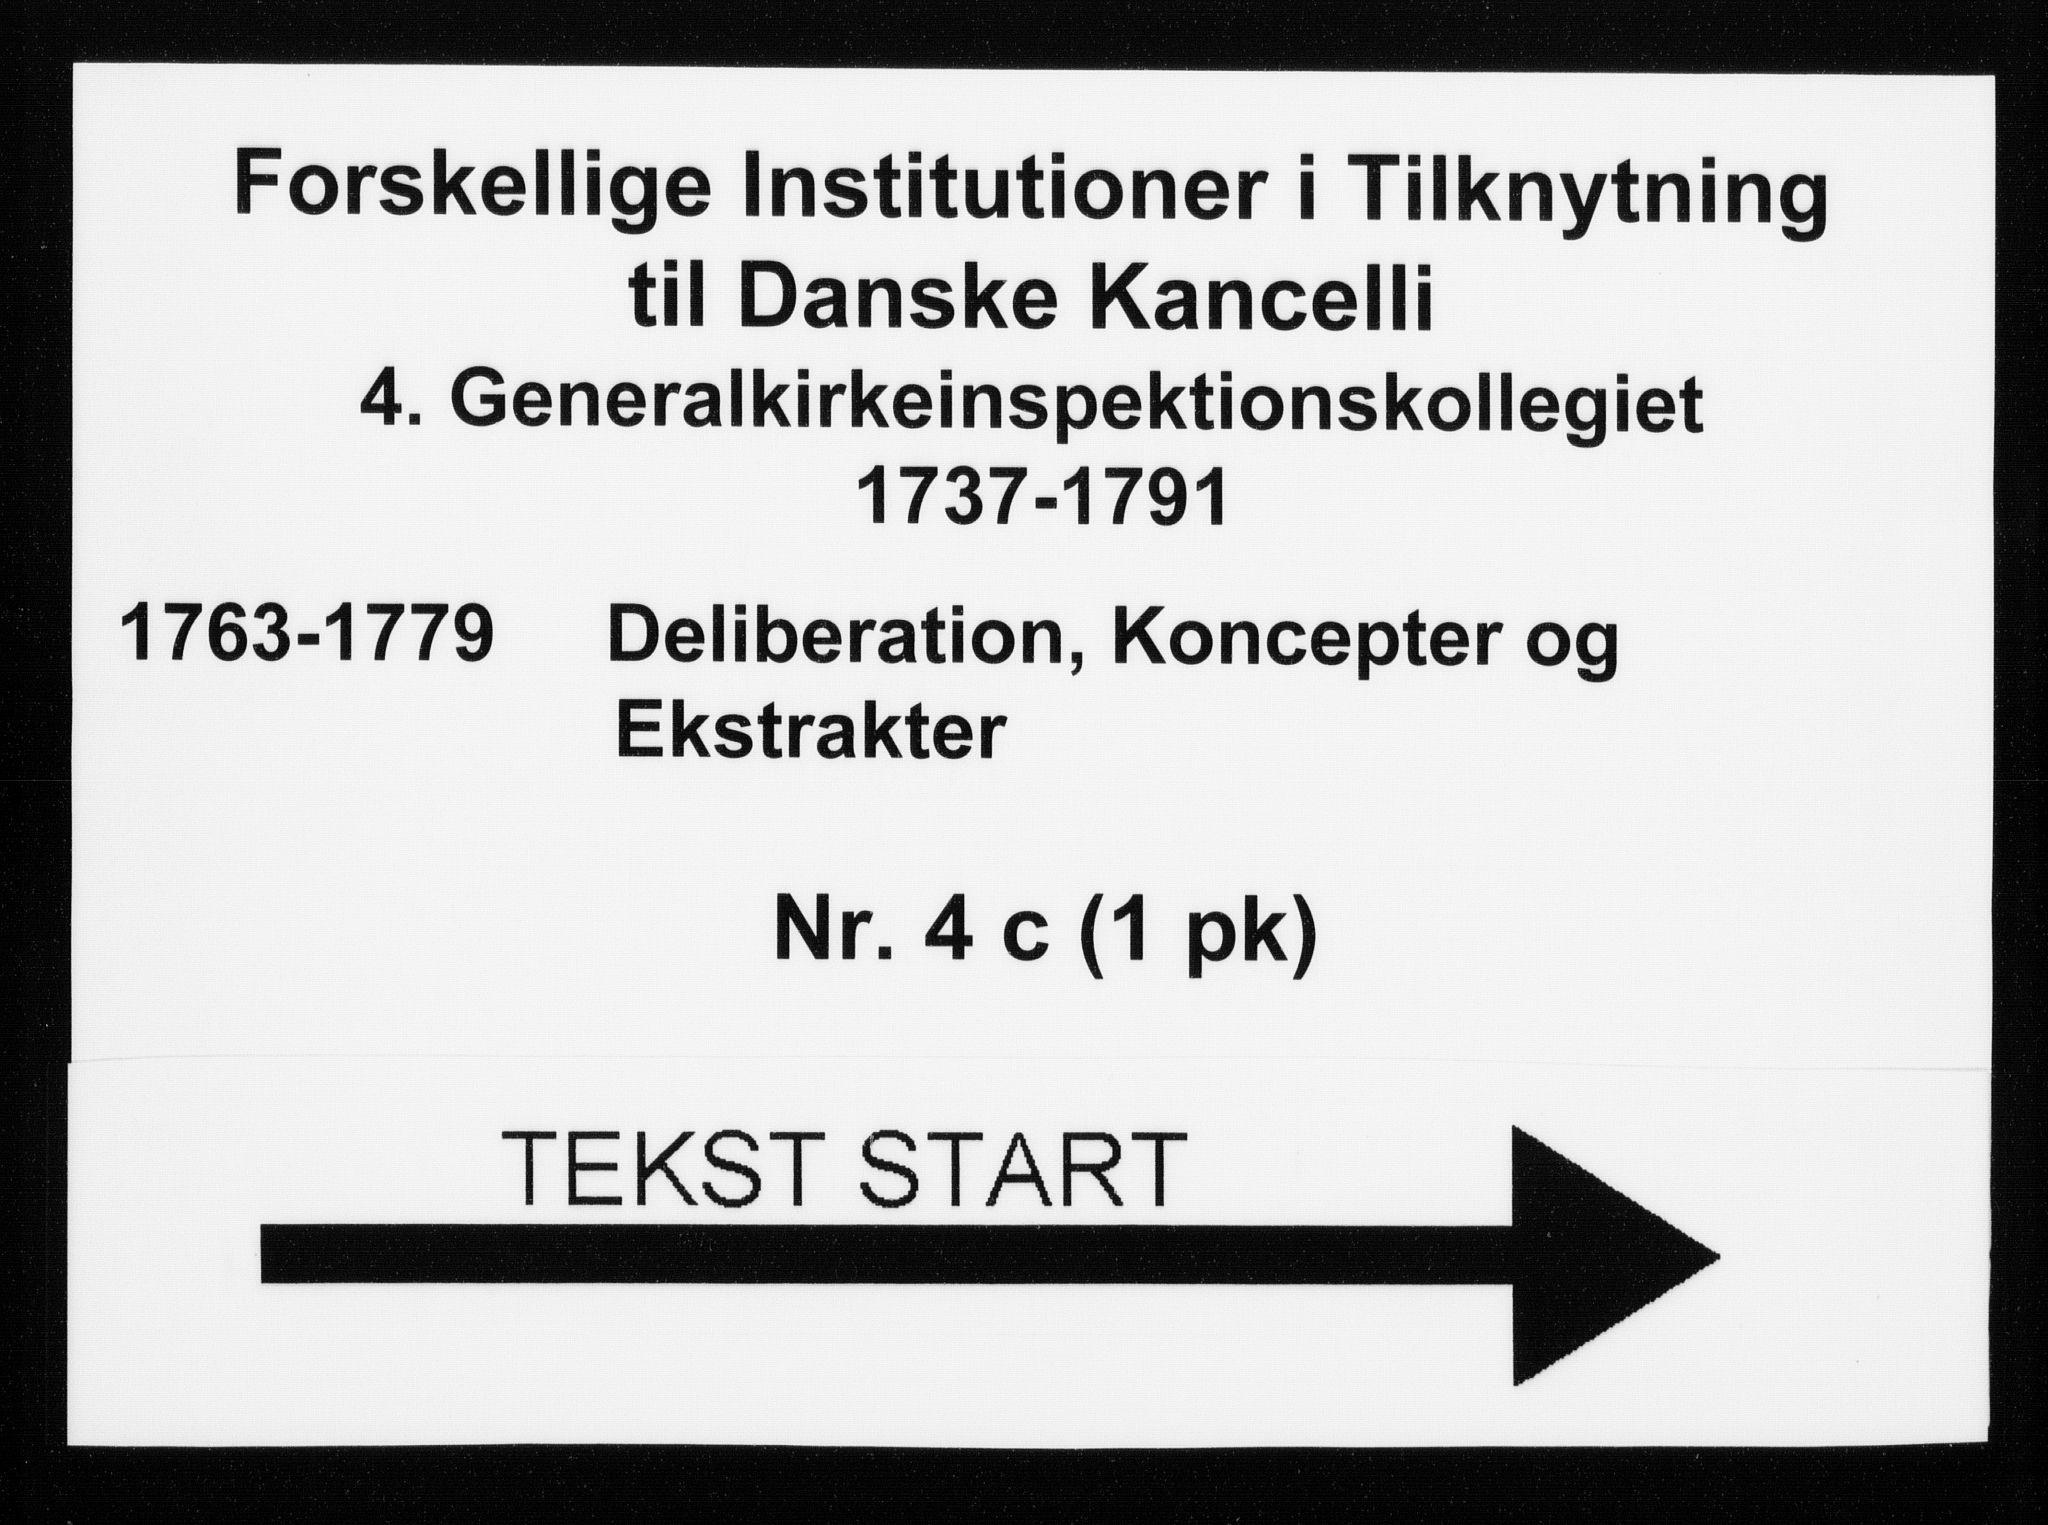 DRA, Generalkirkeinspektionskollegiet, F4-04/F4-04-03: Deliberation, koncepter og ekstrakter, 1763-1779